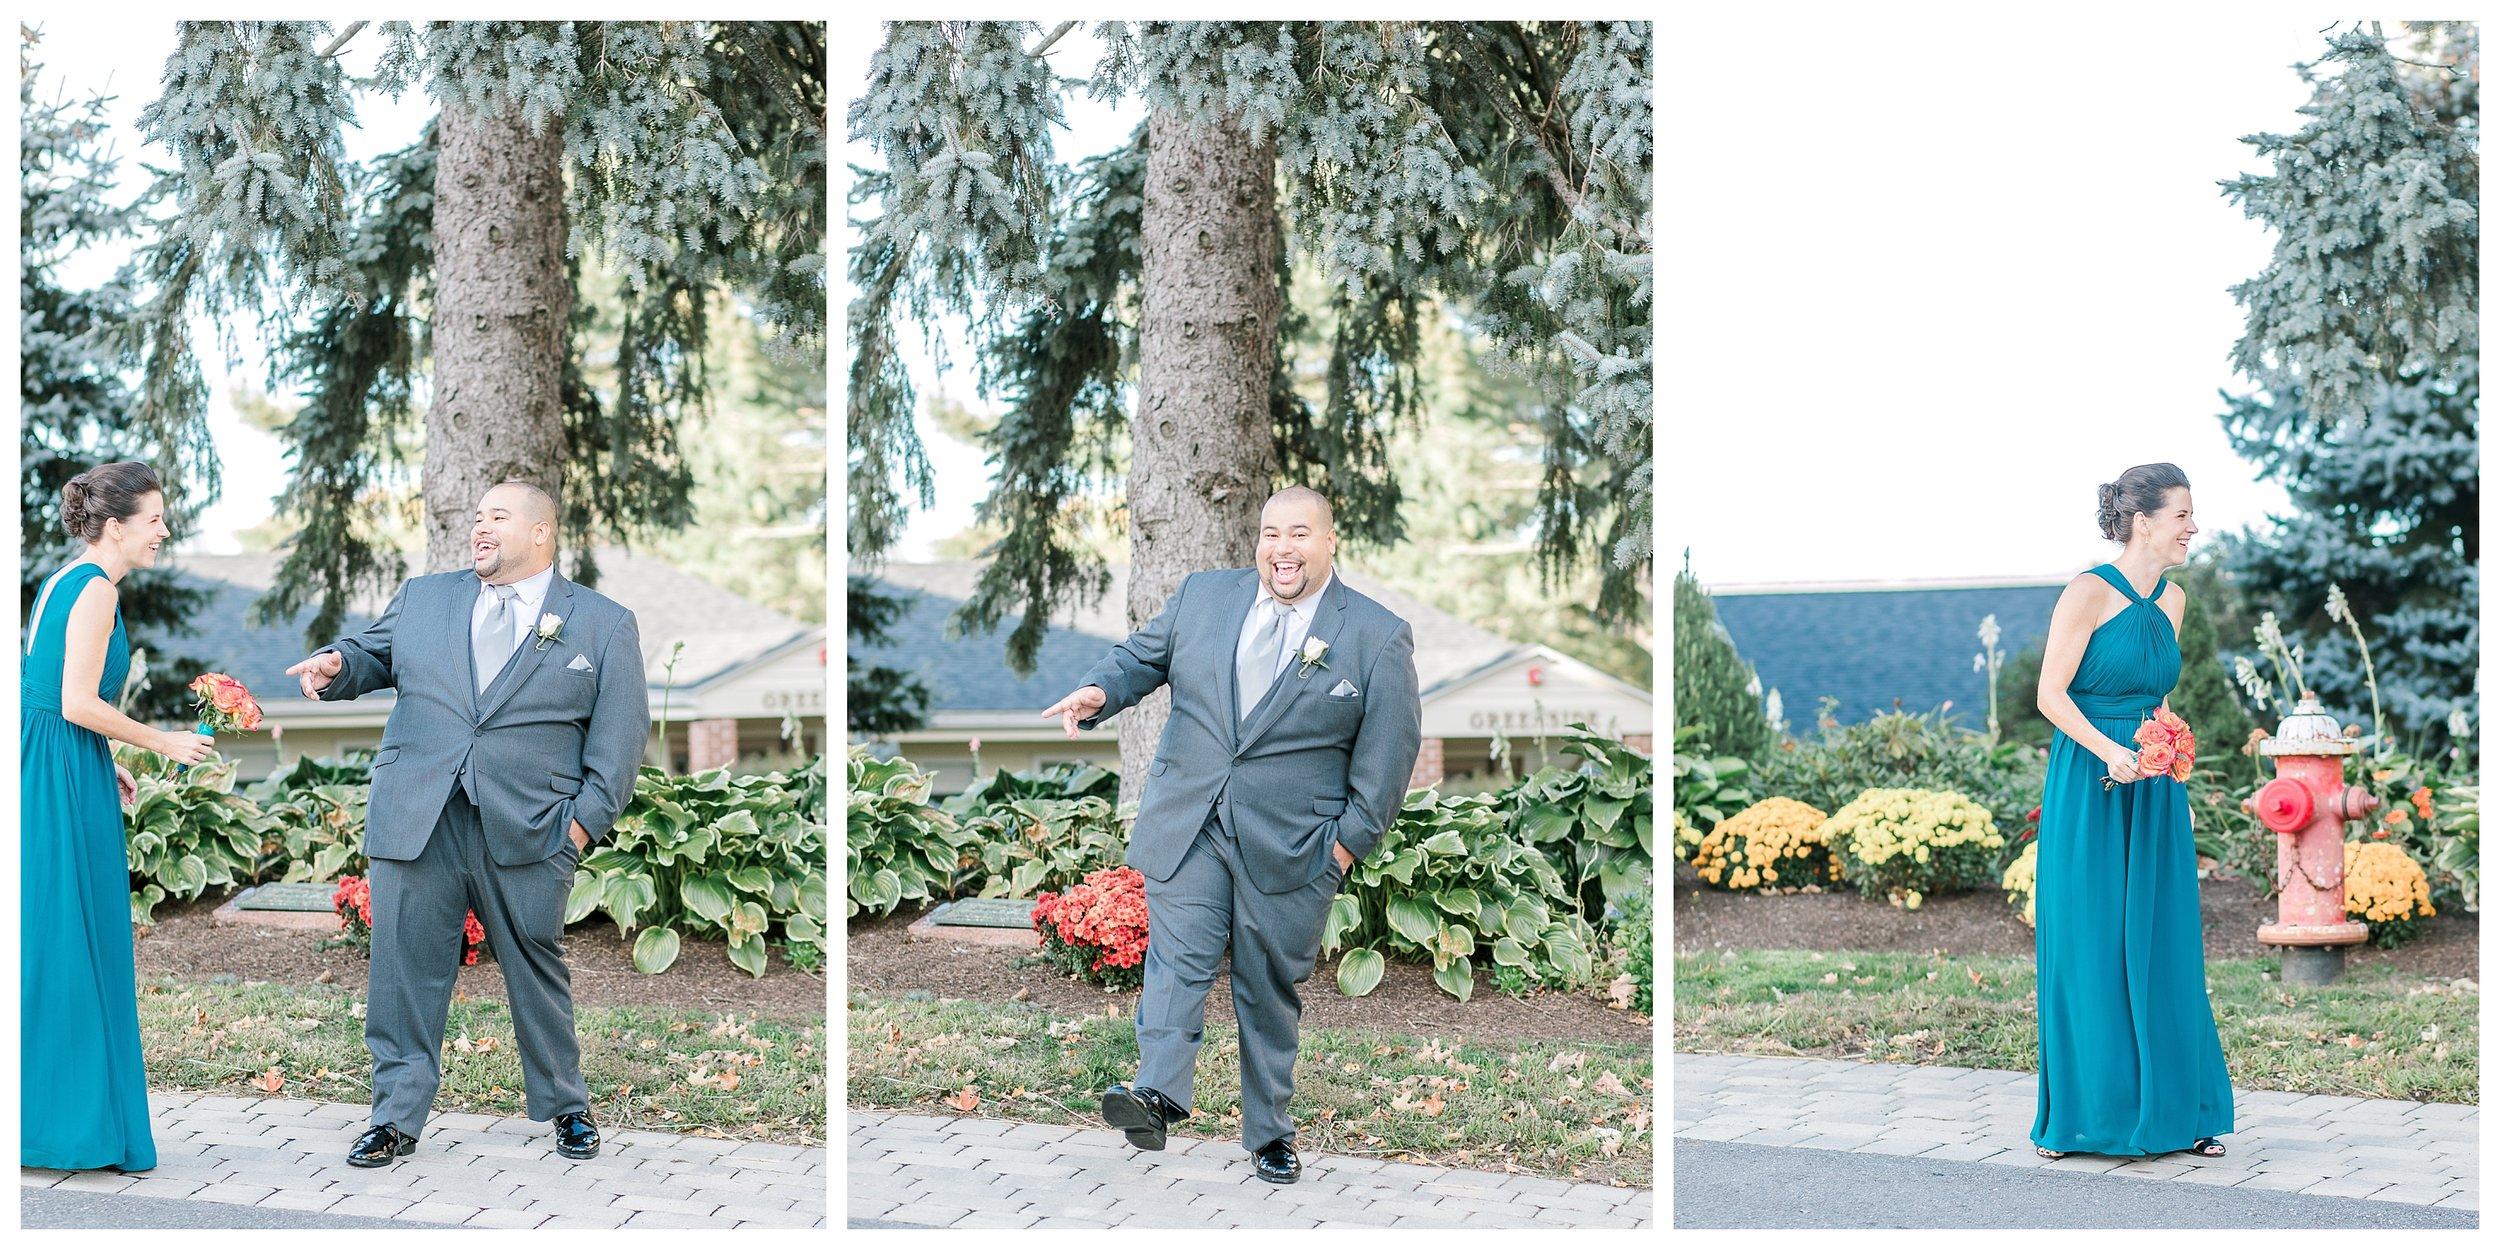 pleasant_valley_country_club_wedding_sutton_erica_pezente_photography (20).jpg